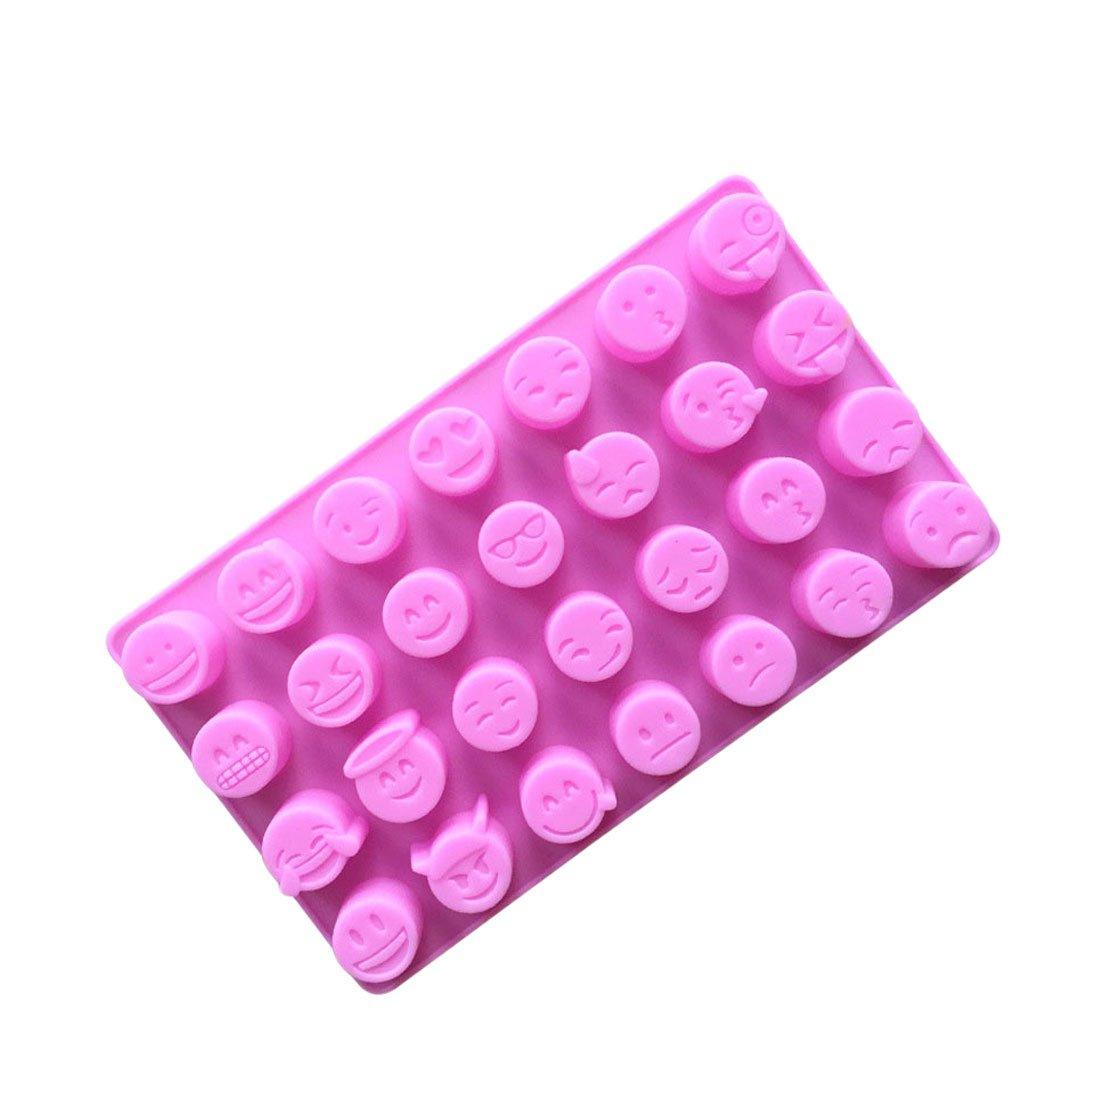 joyliveCY Emoji Silicone Chocolate Candy Jelly Tray Mould